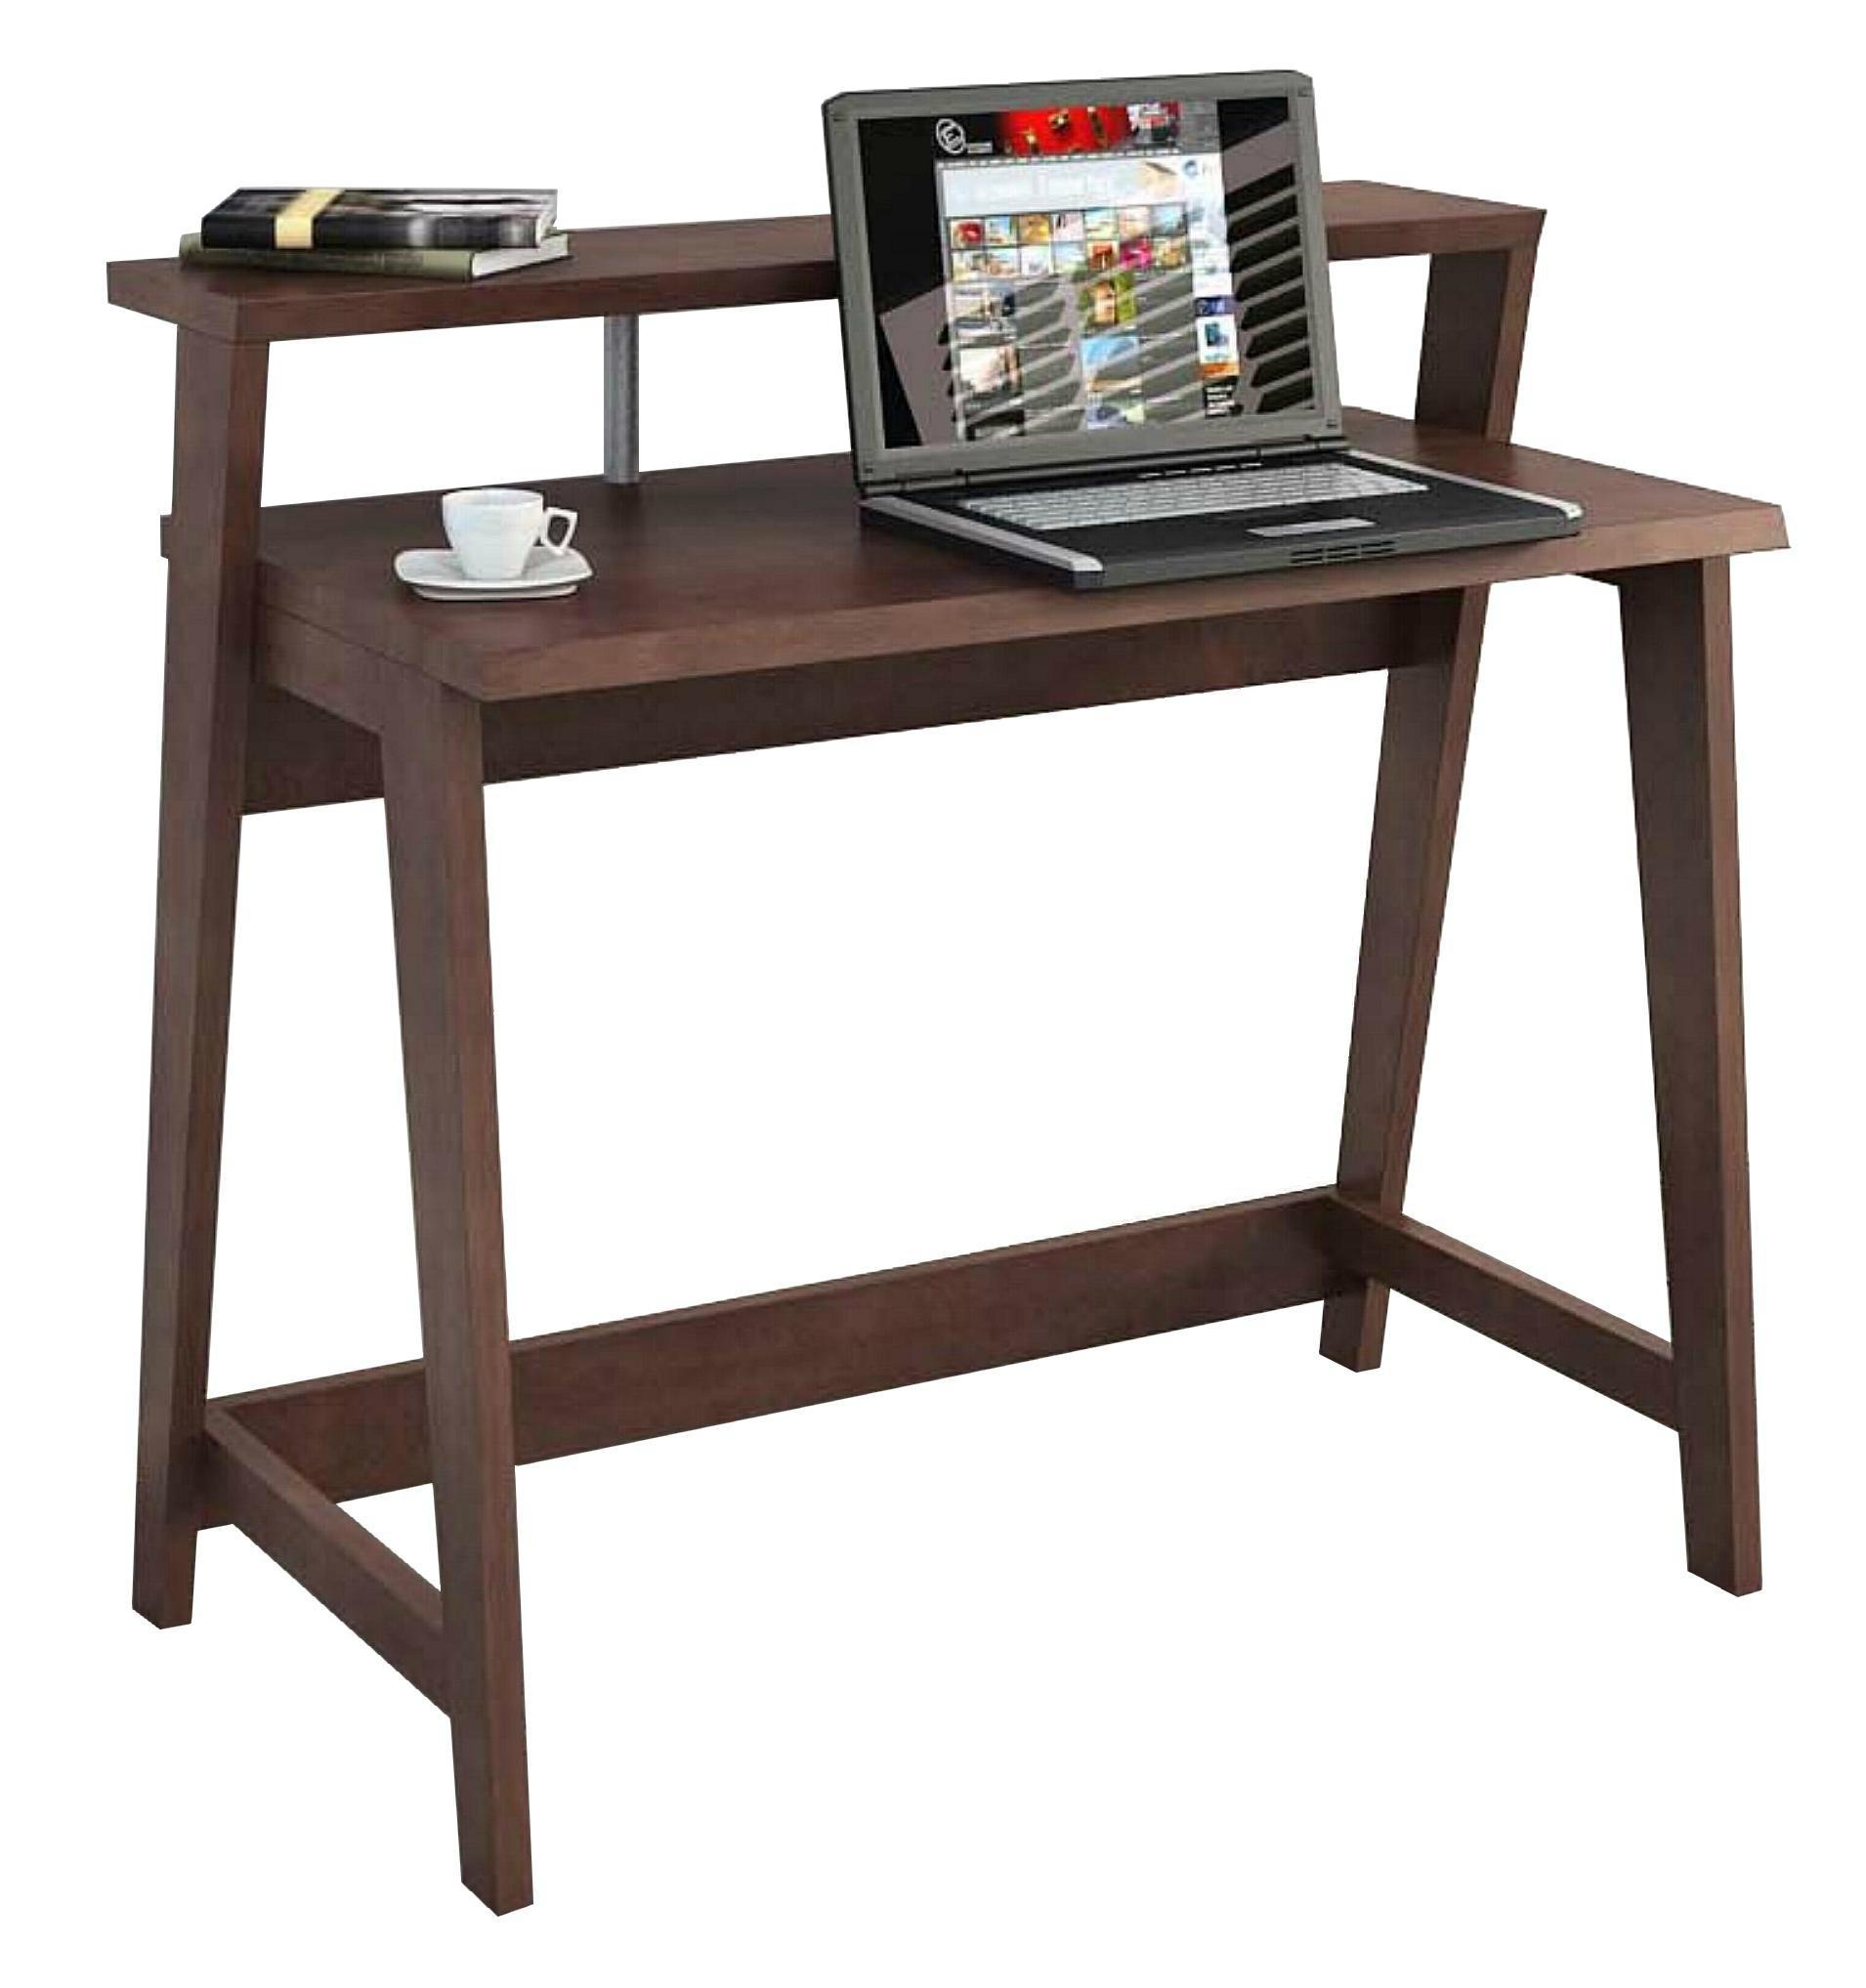 Wooden modern office computer desk laptop table wd